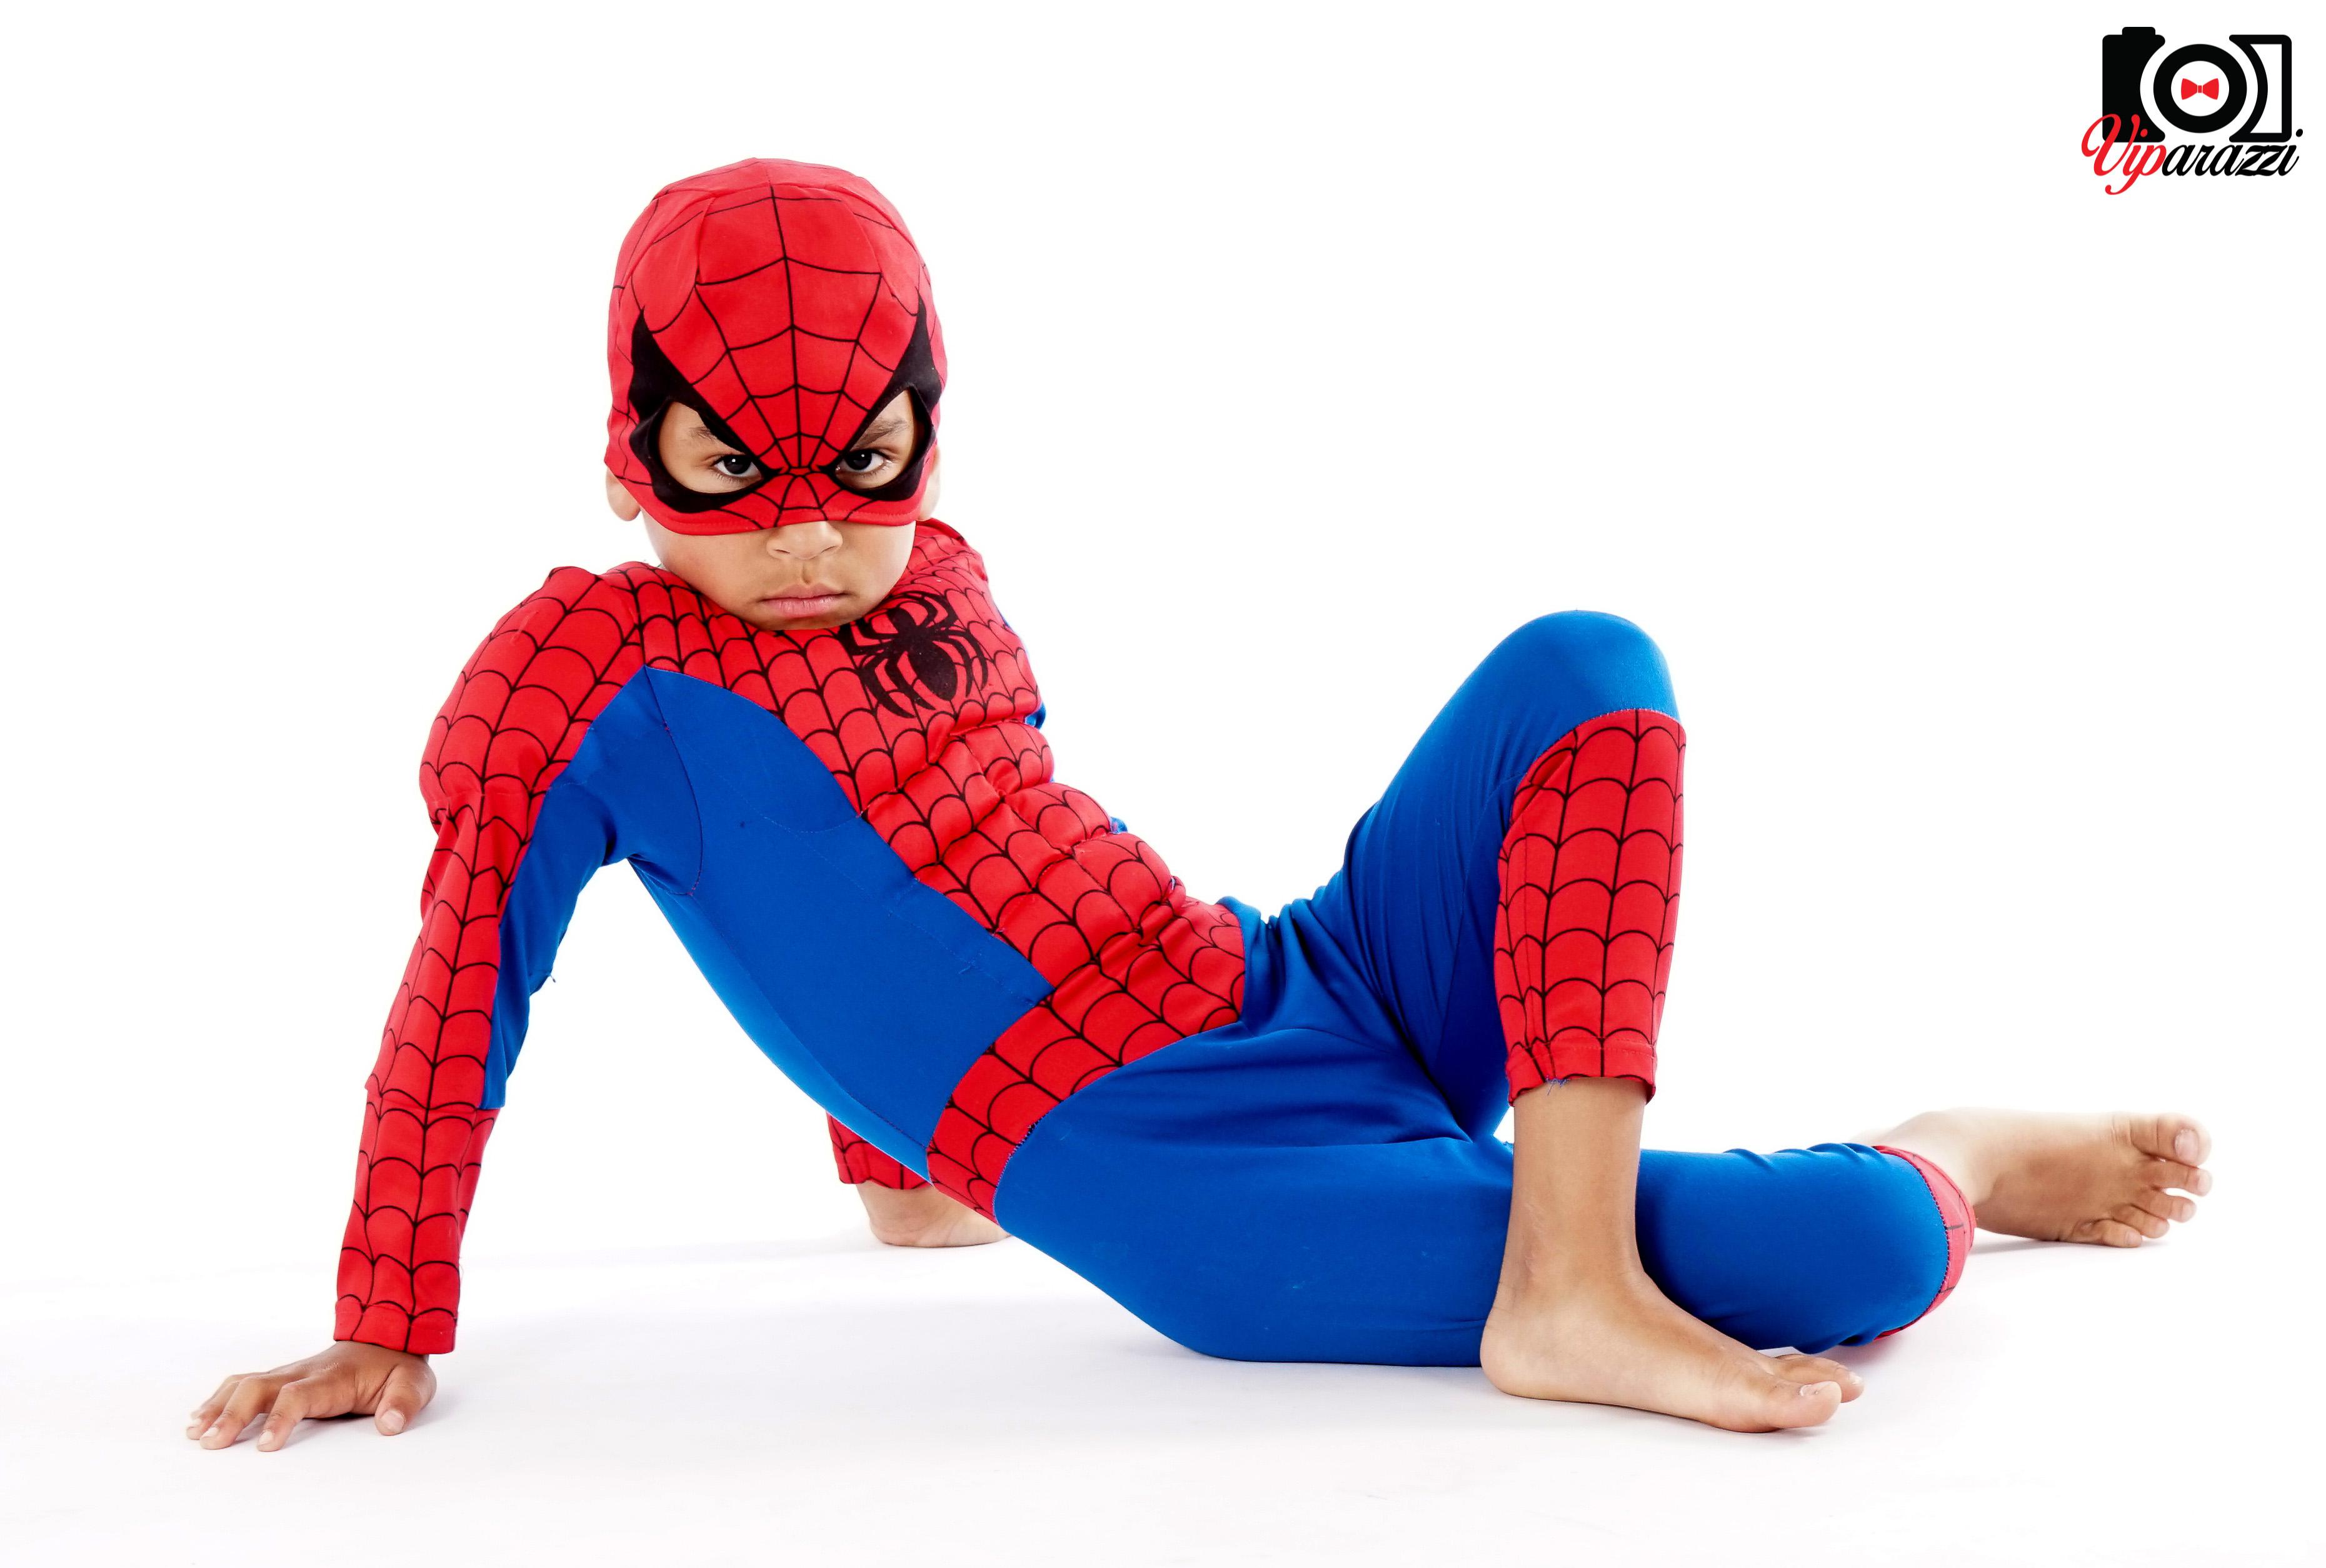 viparazzi - spiderman